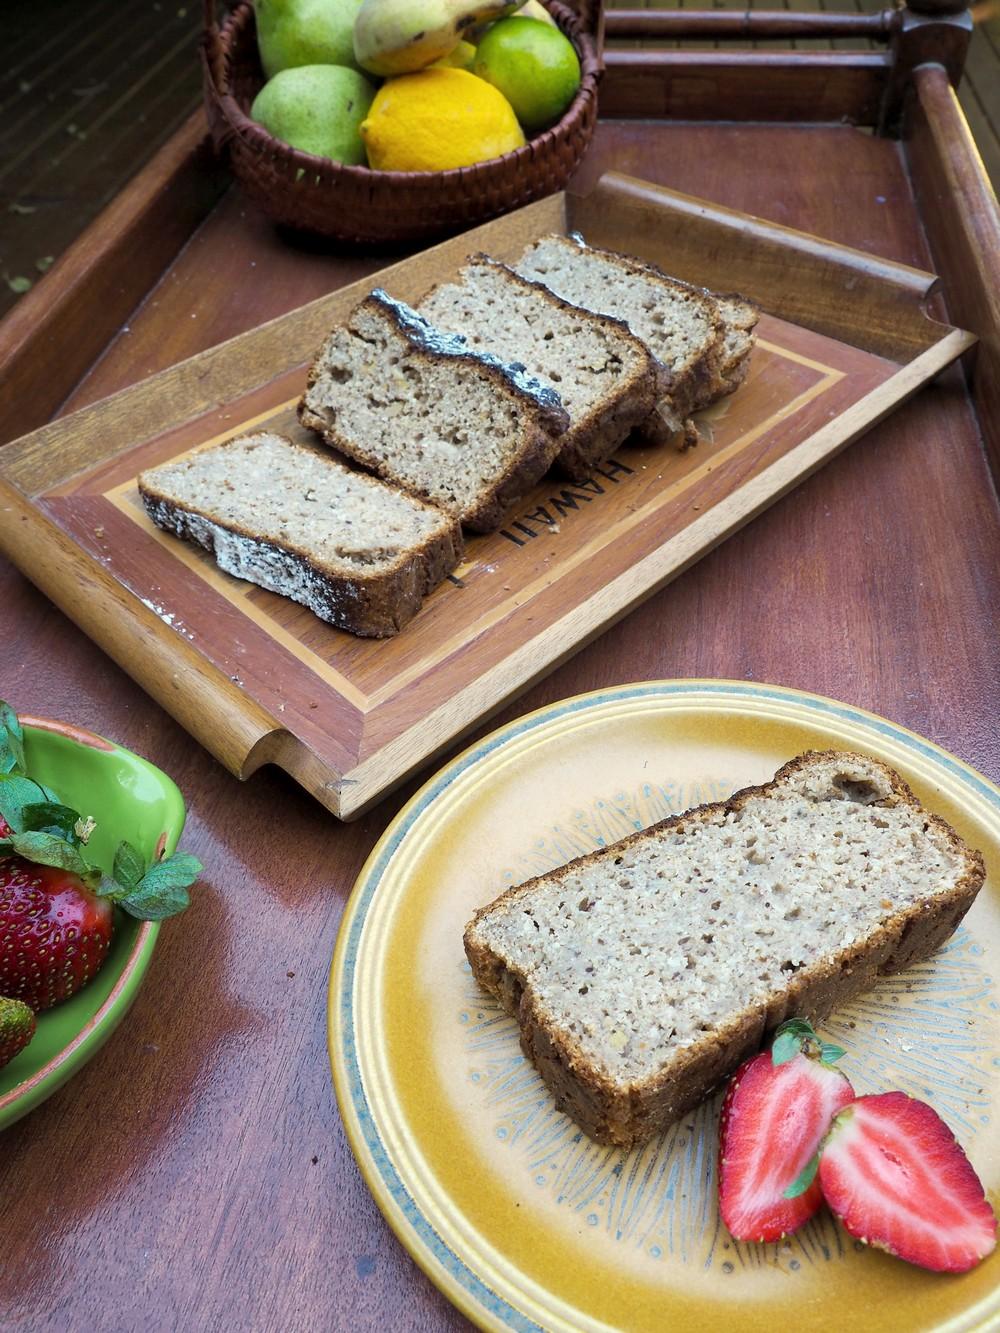 Banana_bread_with_strawberries.jpg